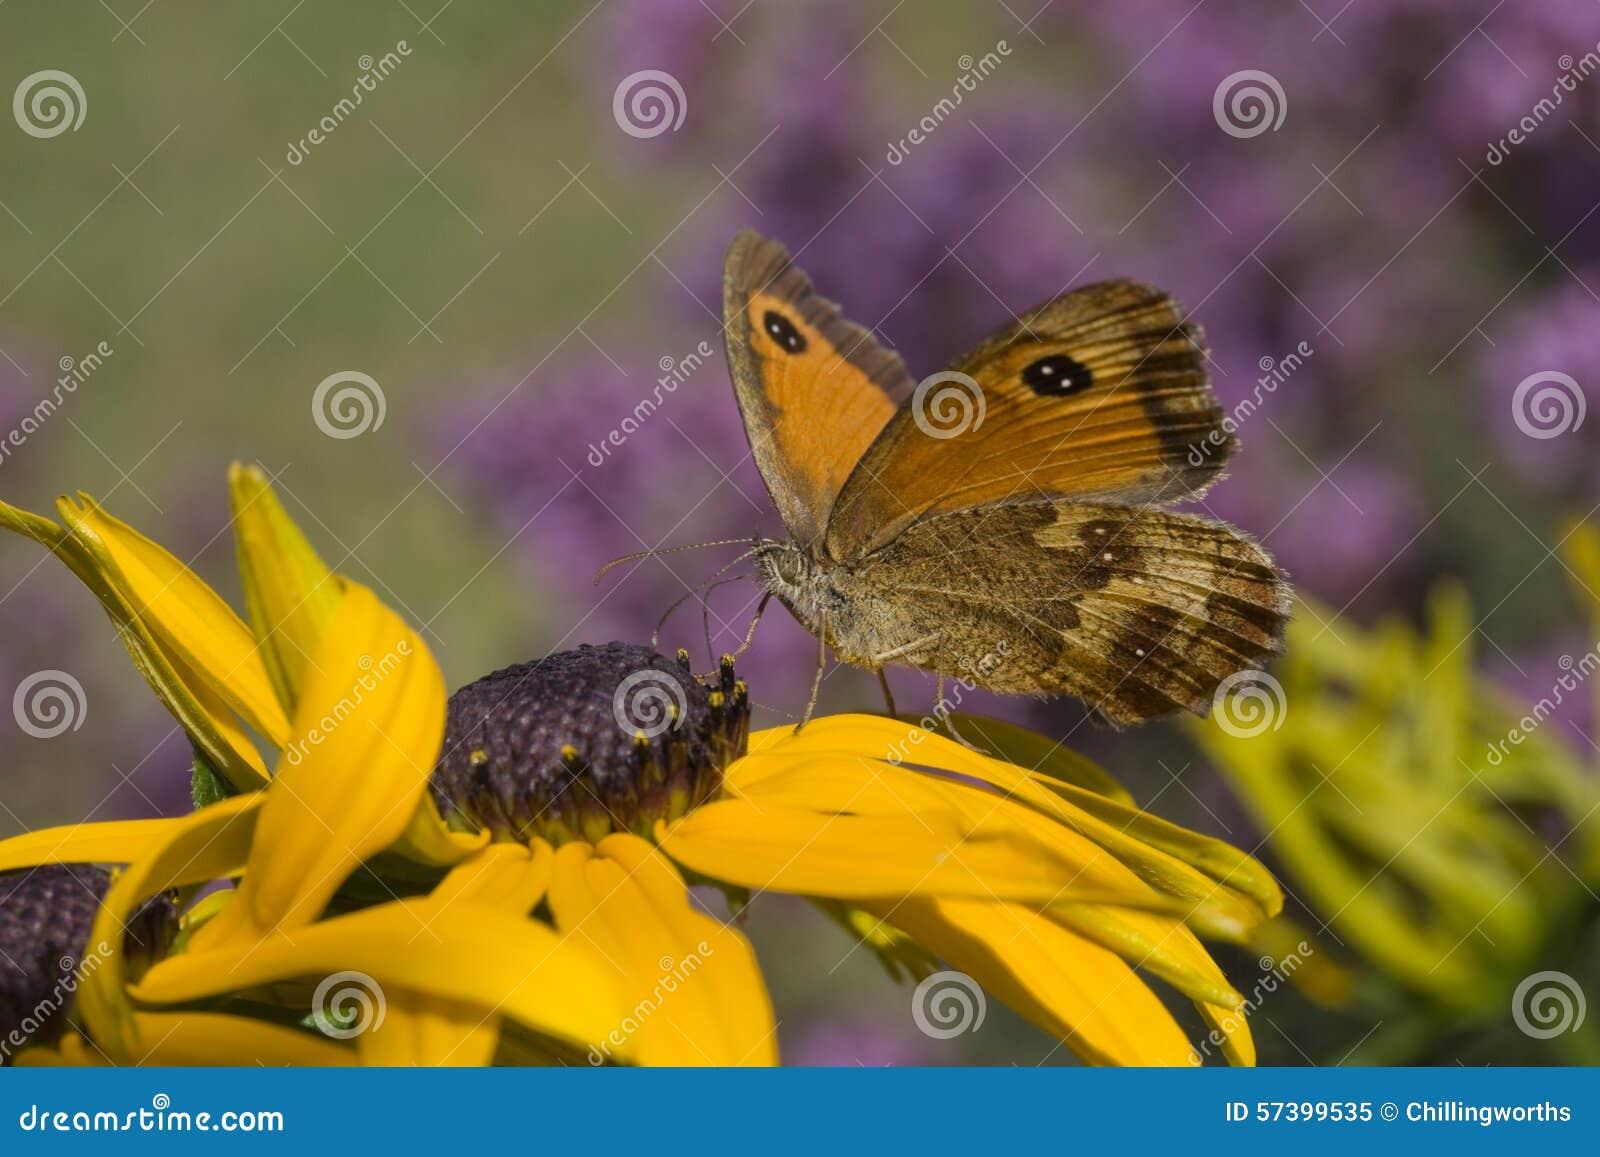 De Vlinder van de portier (tithonus Pyronia)